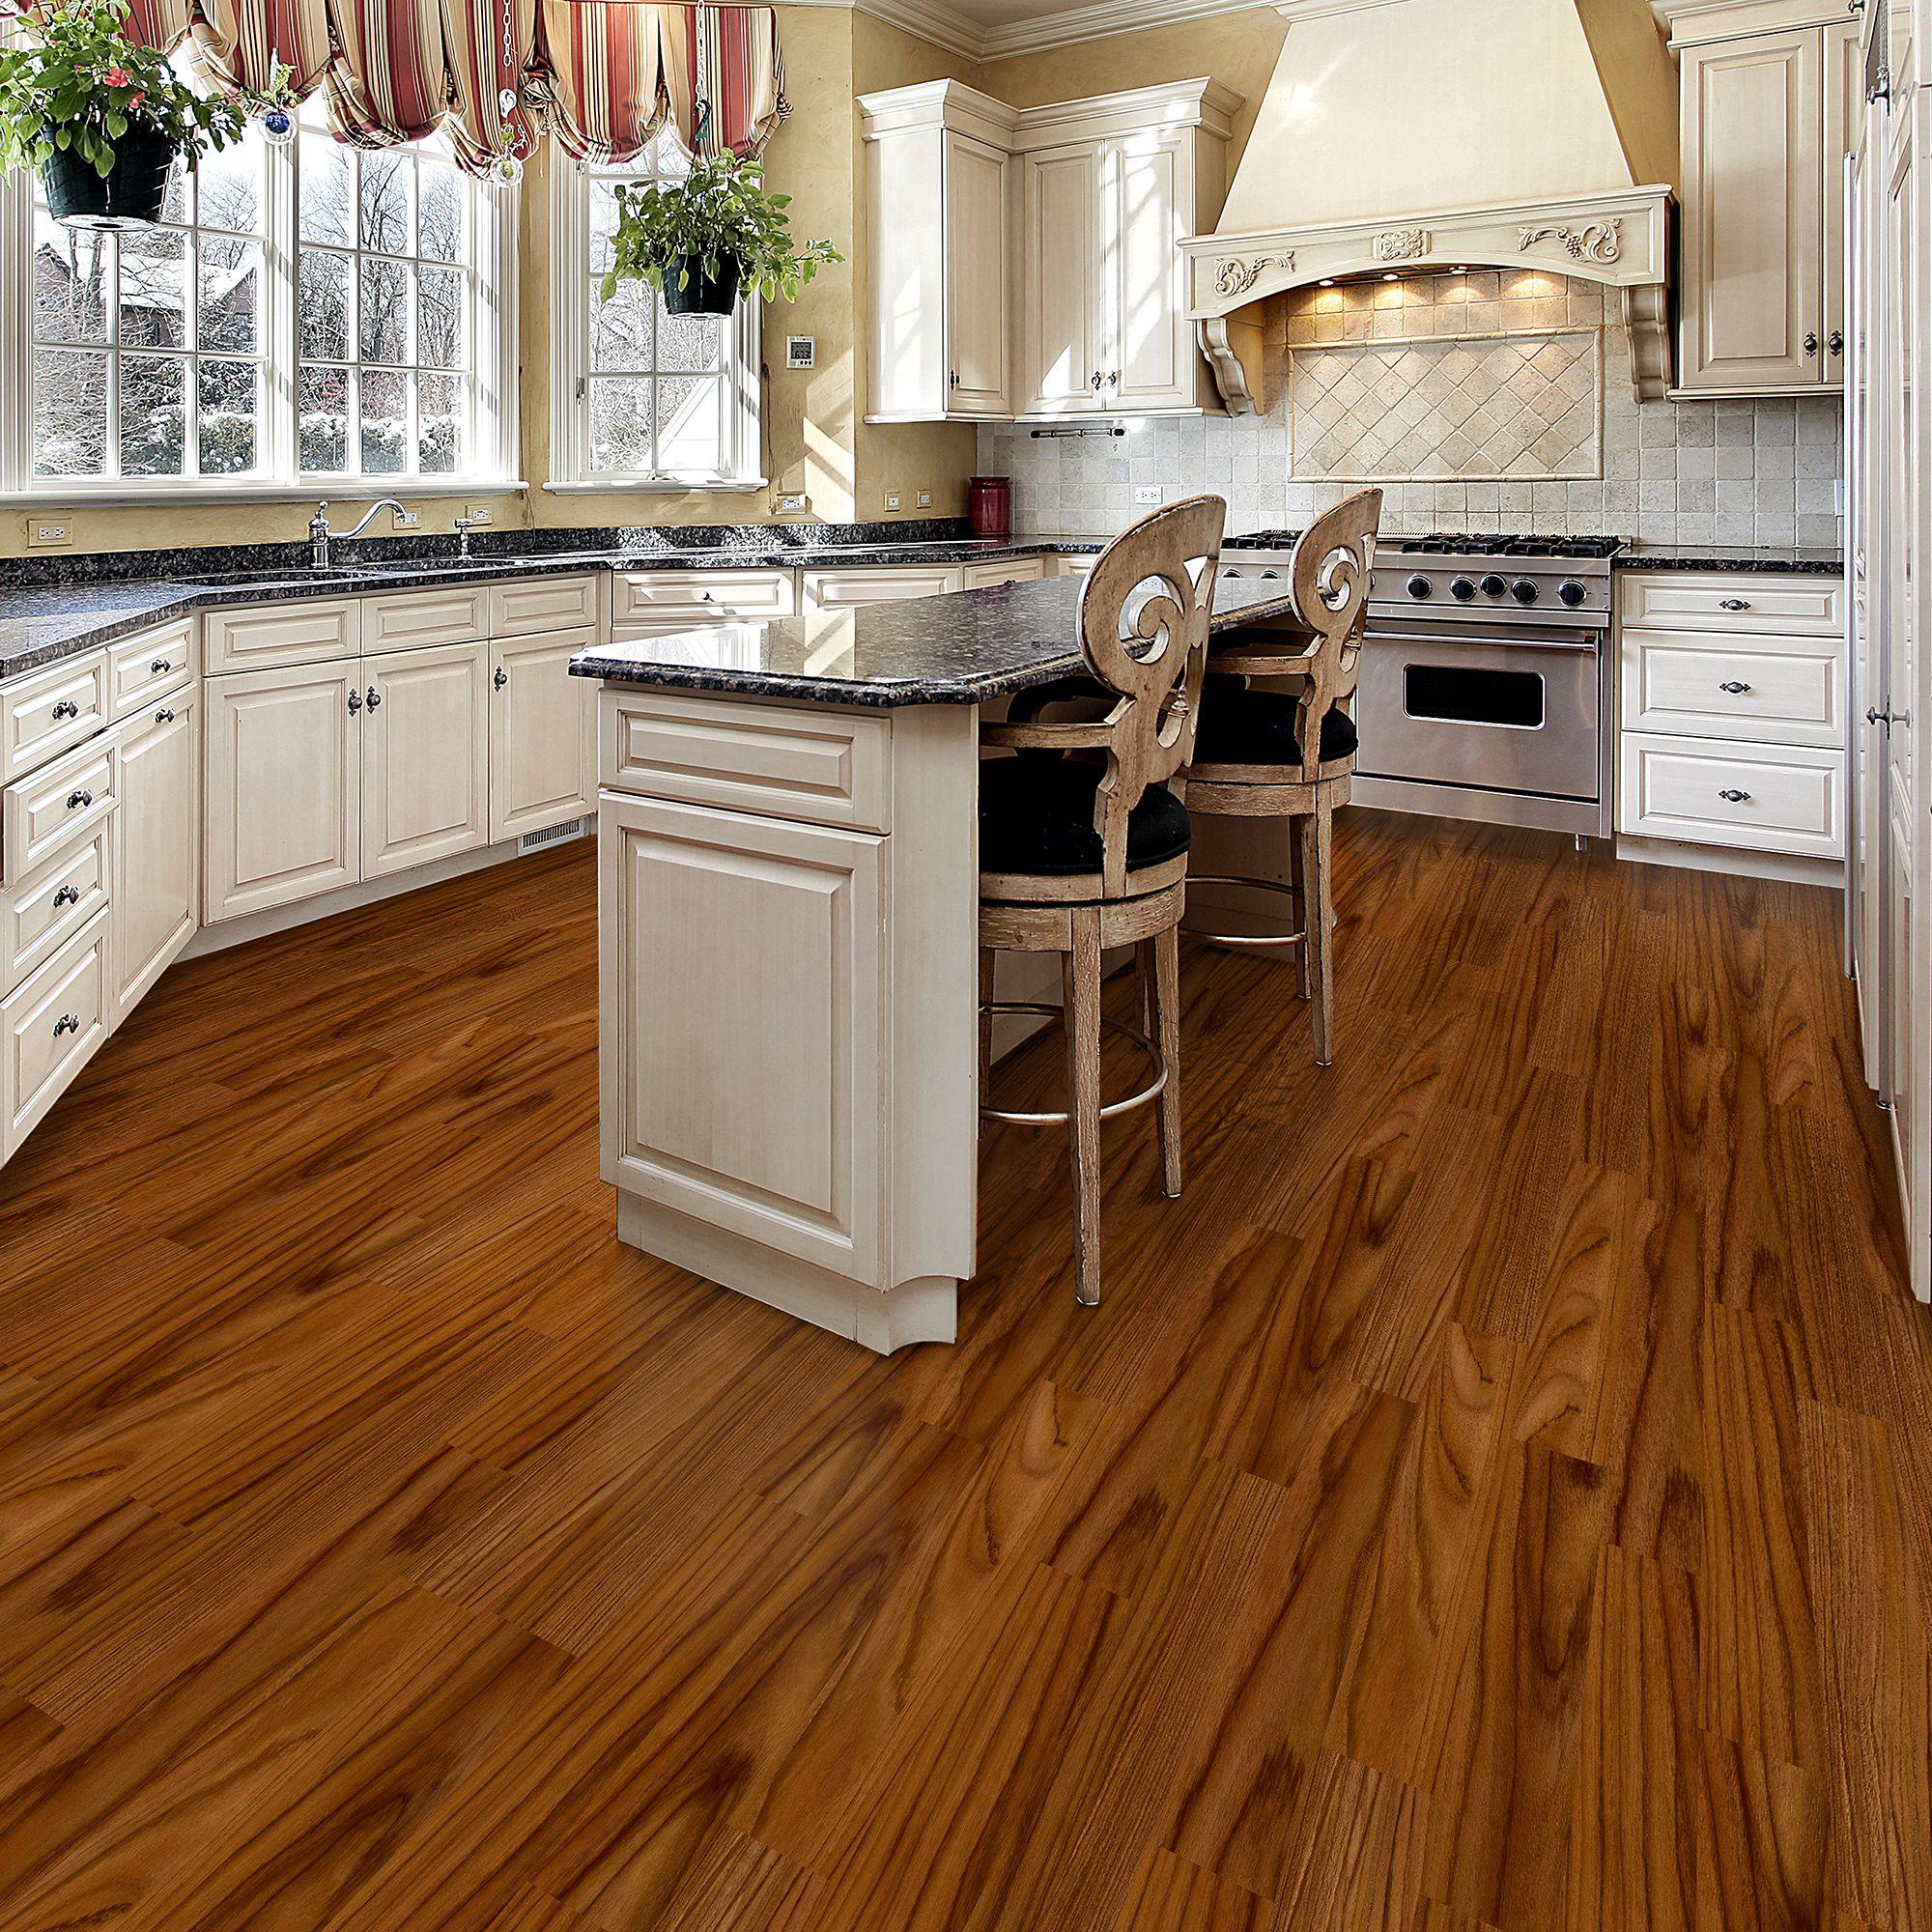 Pin by Sarah Rich on Home improvement Luxury vinyl plank